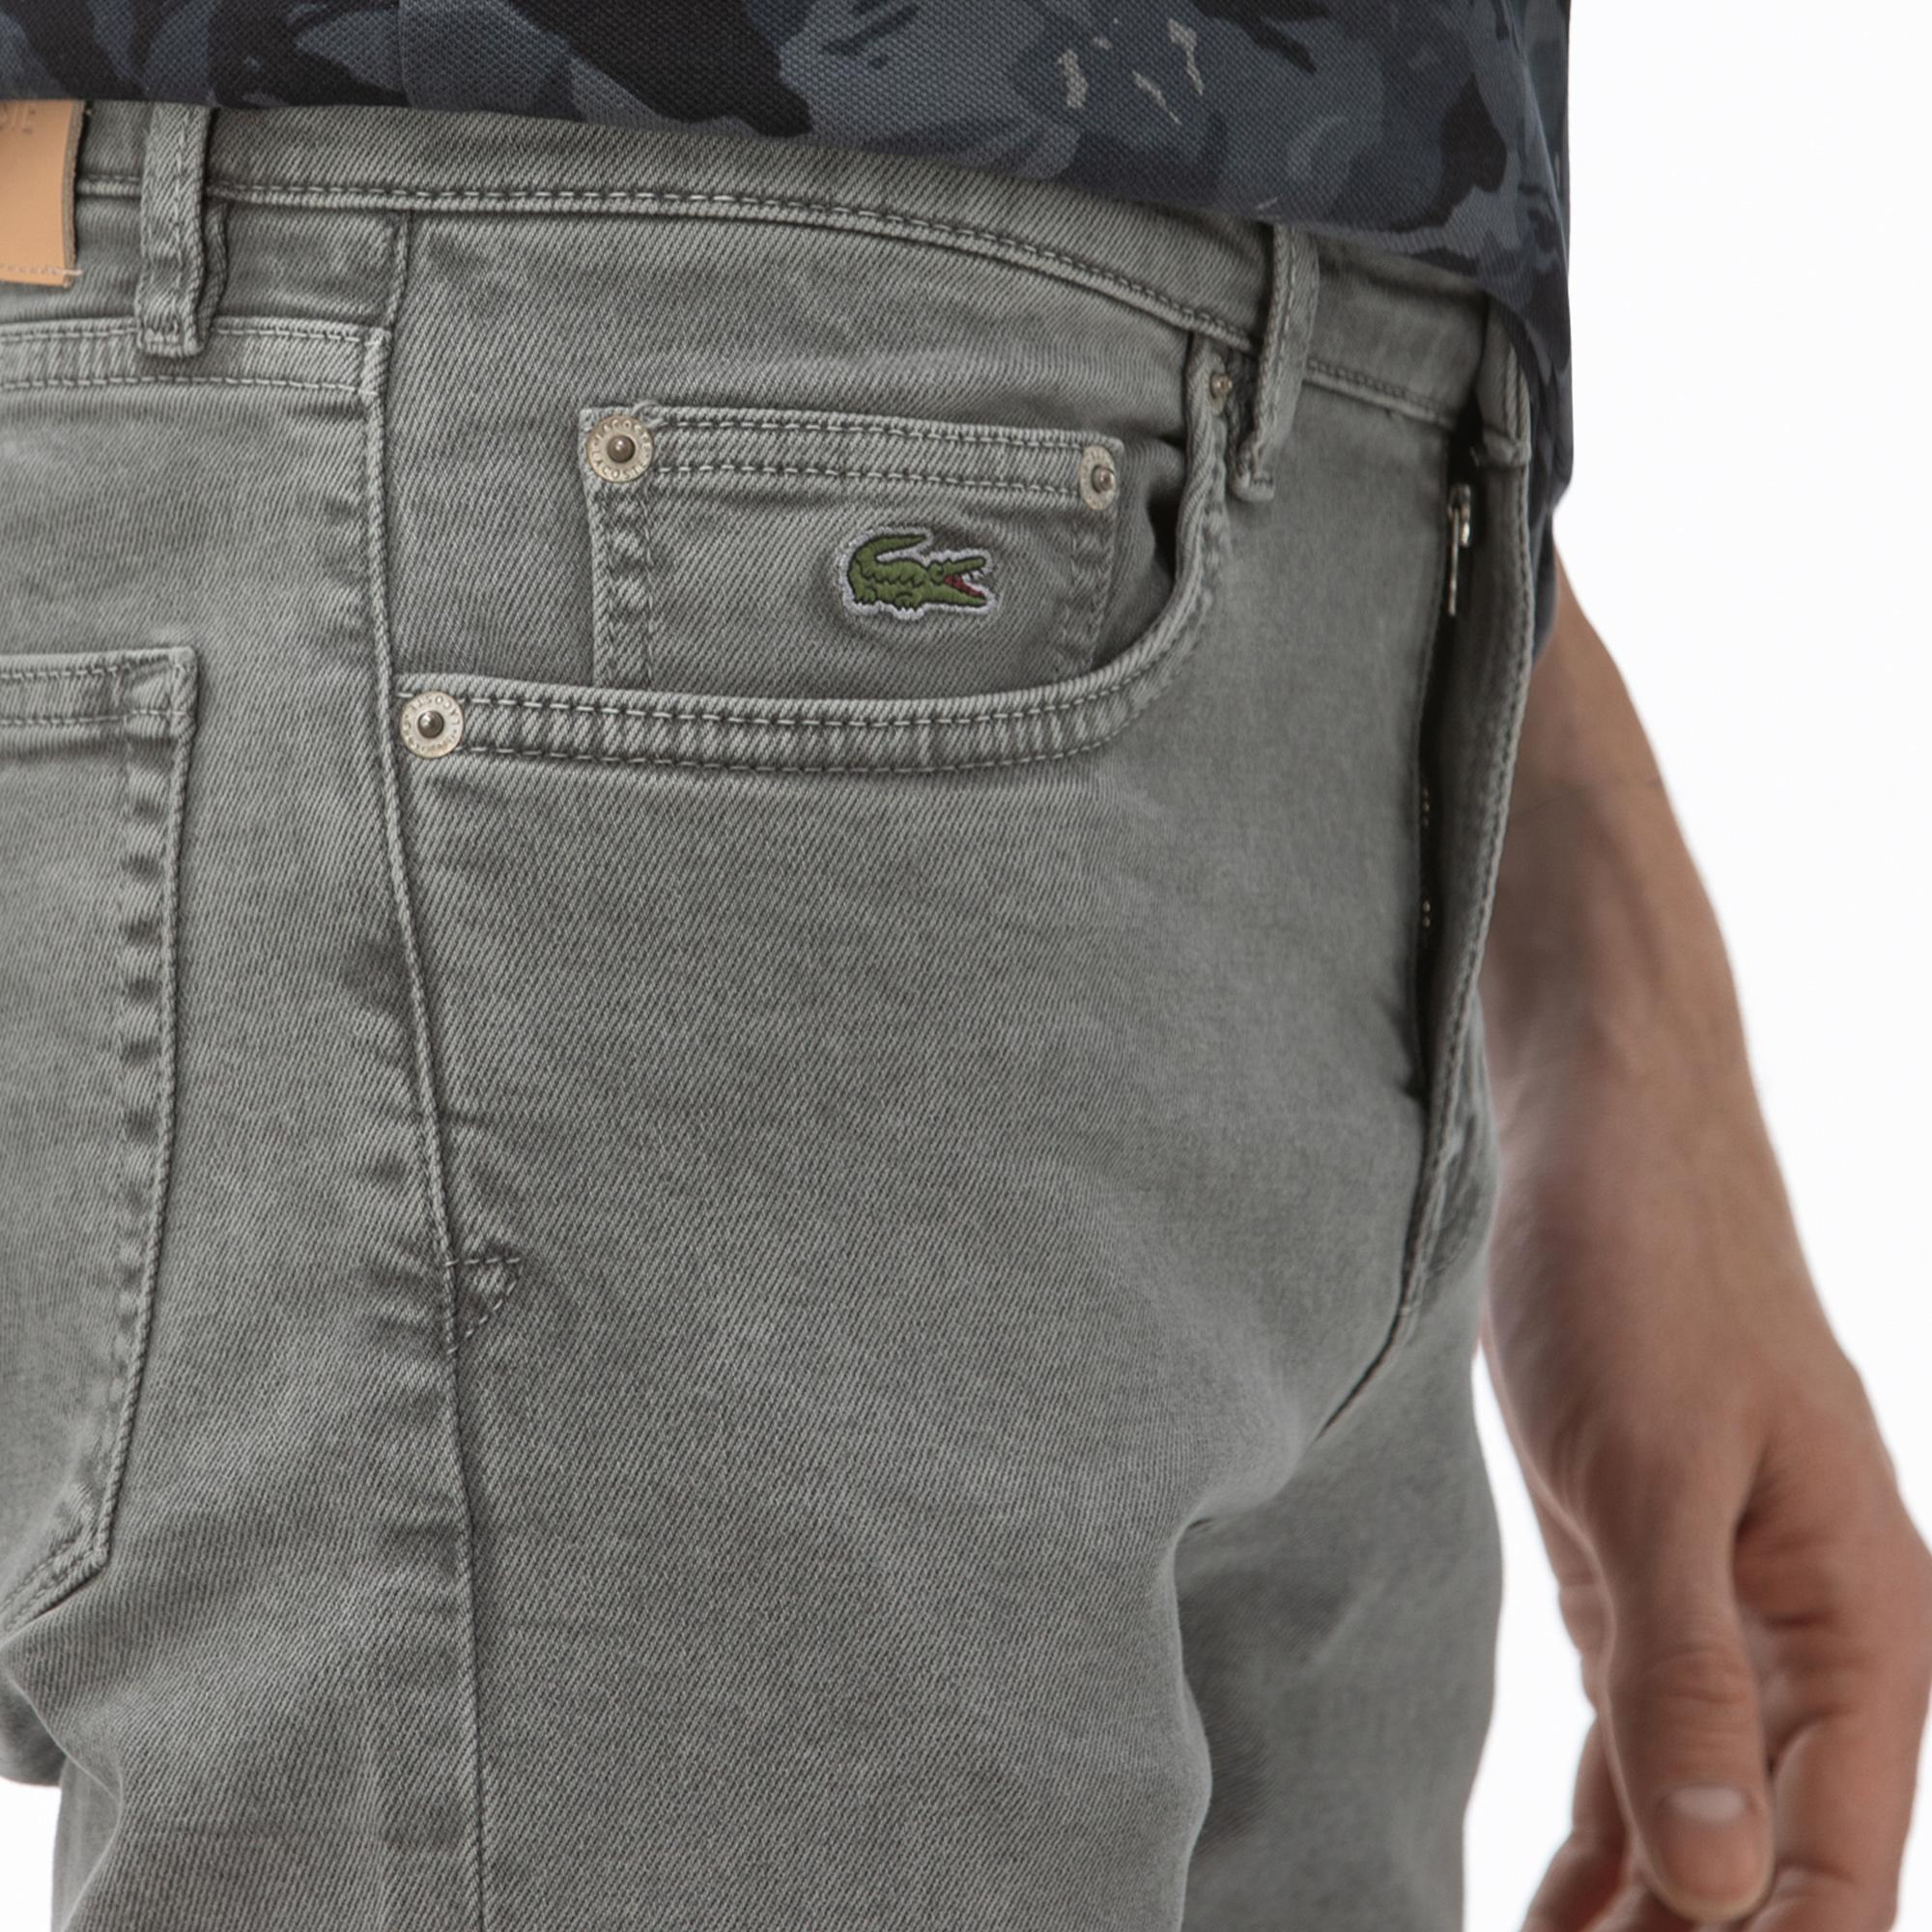 Lacoste Erkek Slim Fit Denim Gri Pantolon